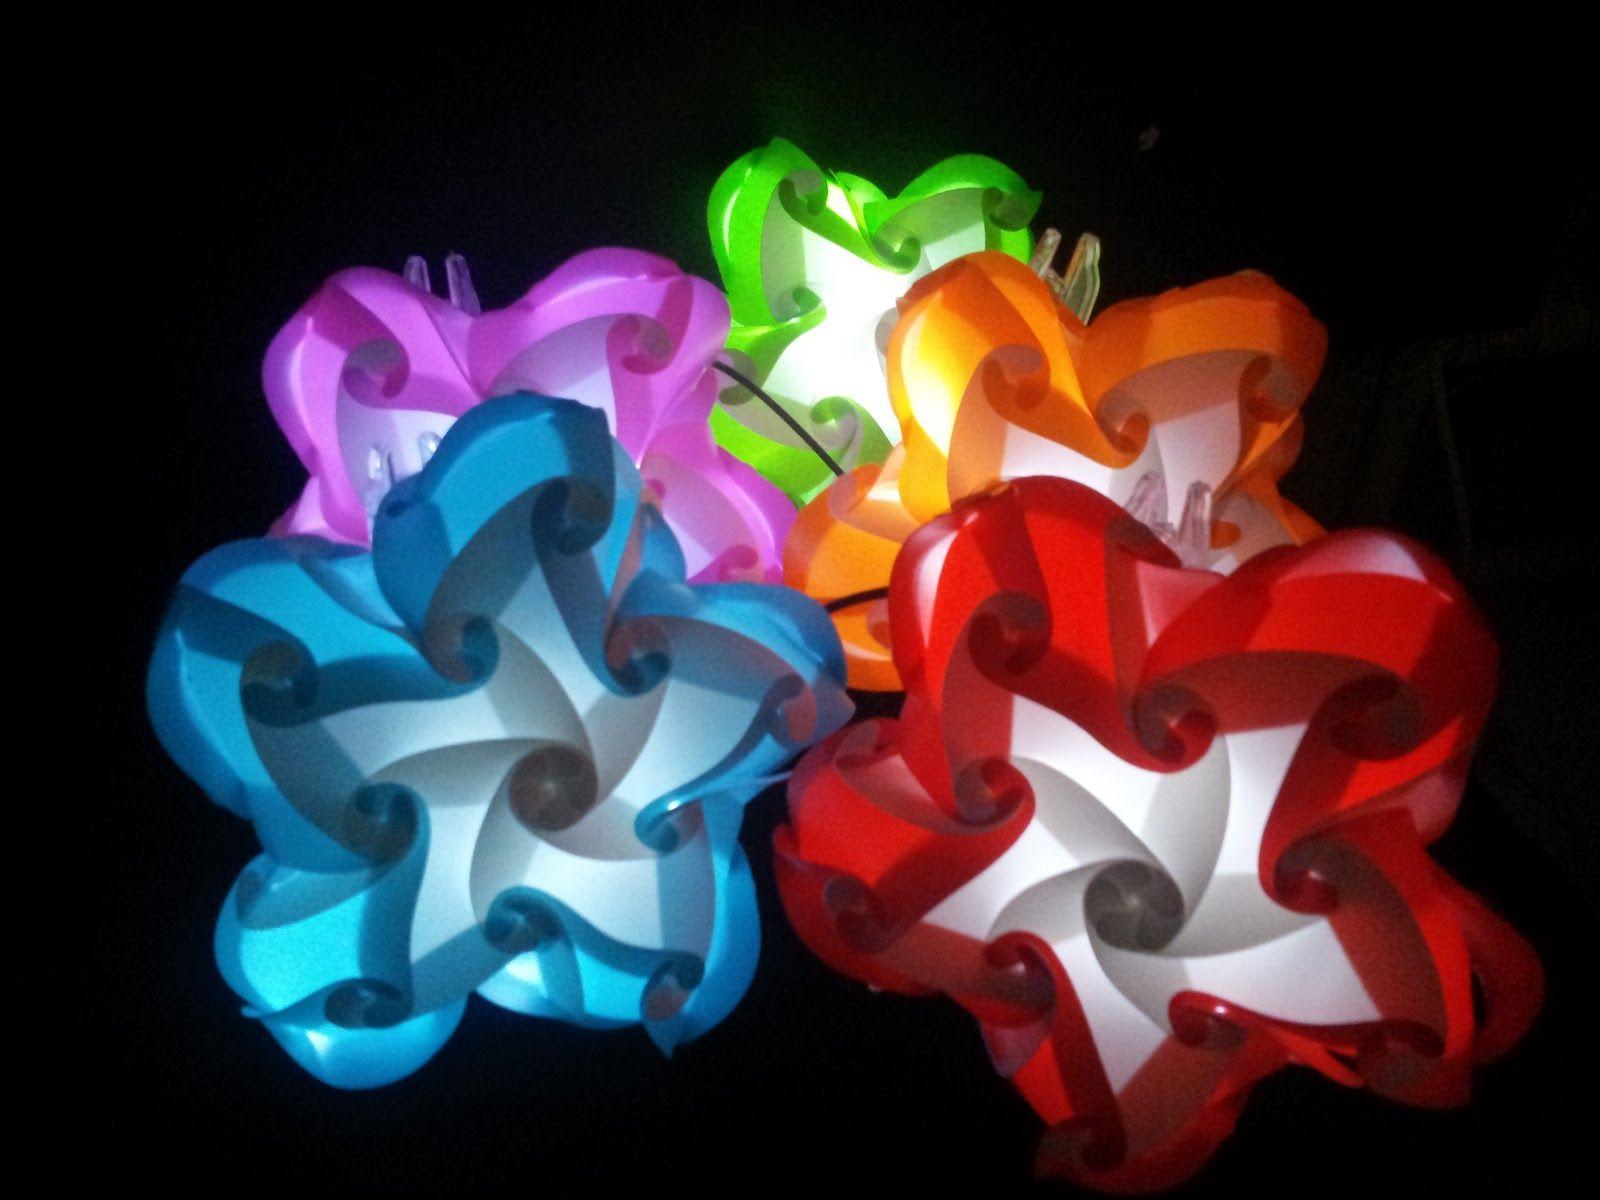 Vlightdeco Iq Light Puzzle Pendant Jigsaw Lamp Styles Iq Light Jigsaw Lamp Vlightdeco Mini Flower Light Origami Lamp Crafts Flower Lights